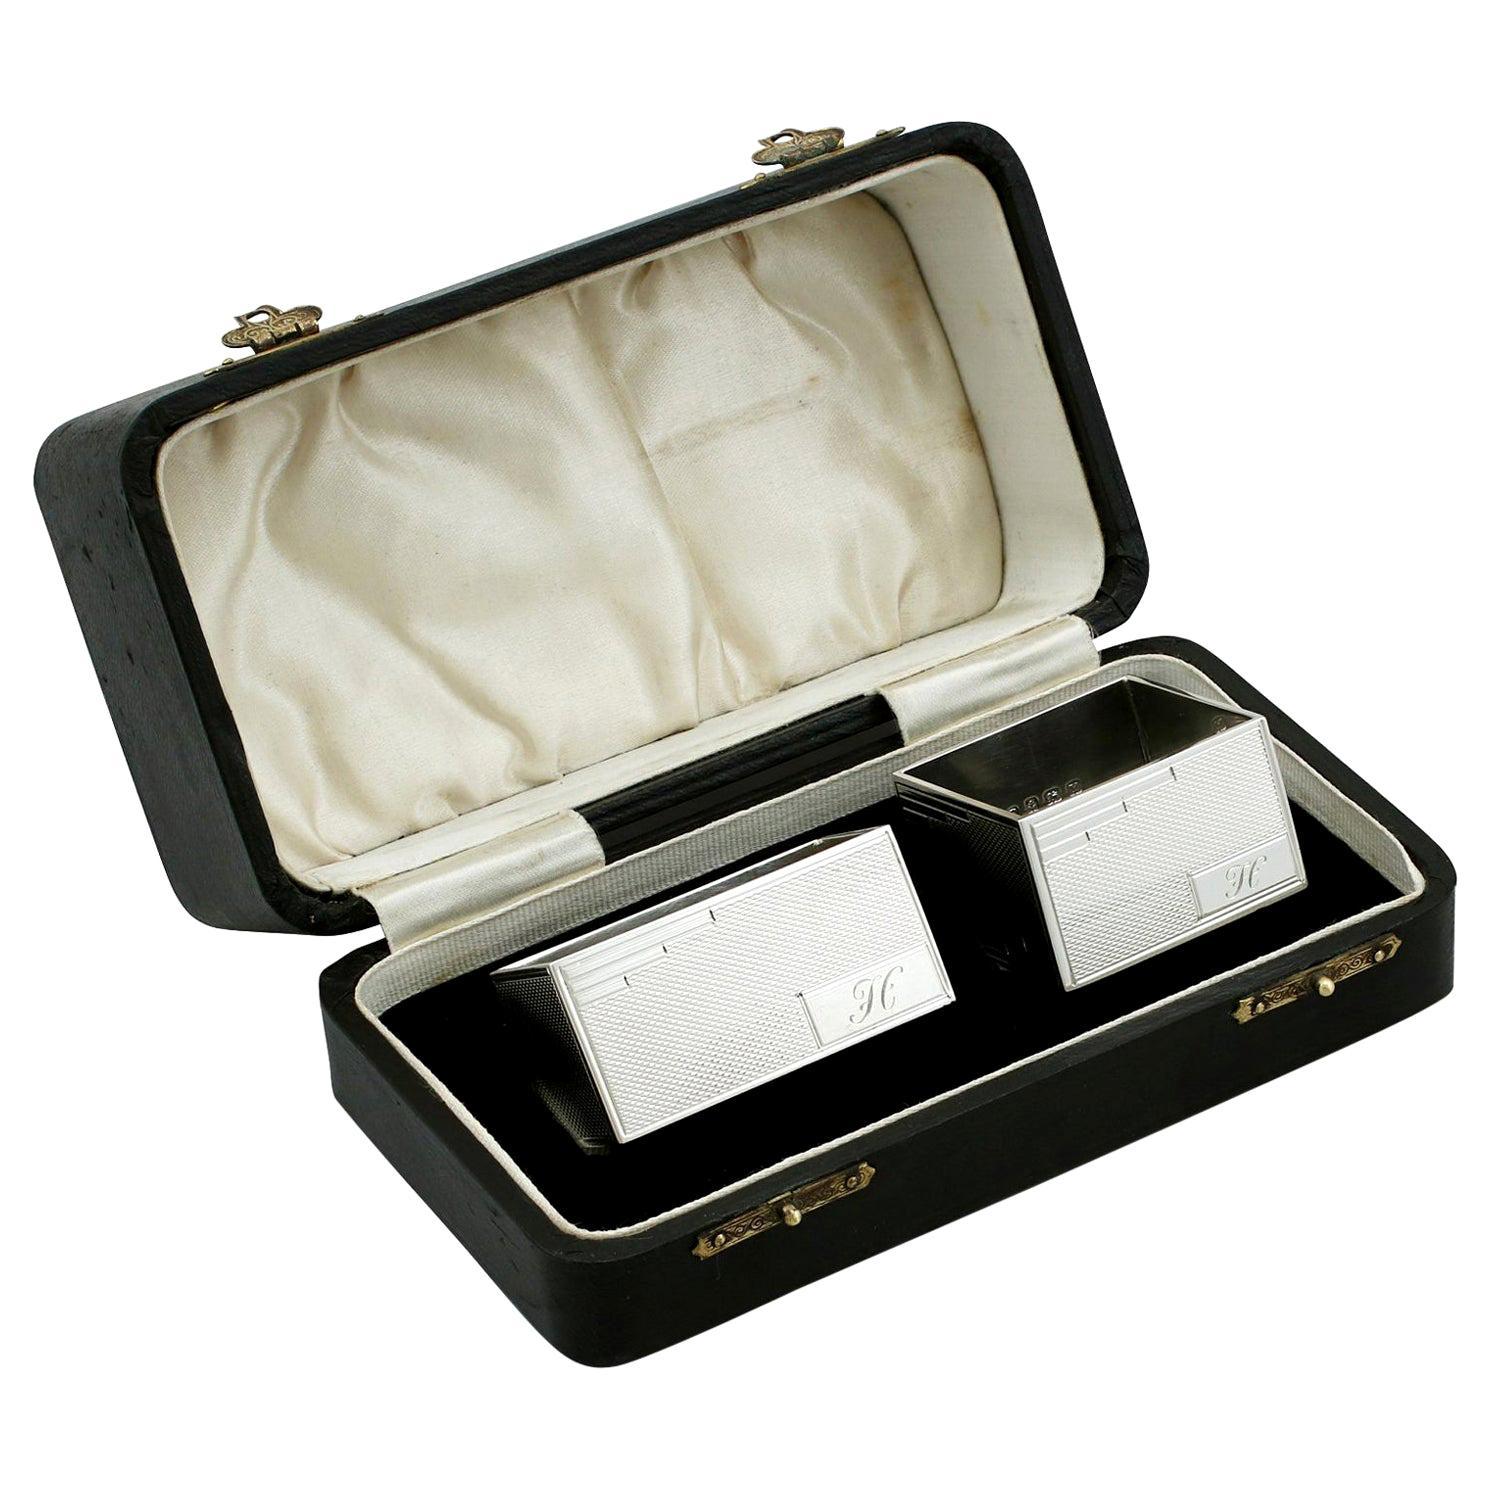 Vintage George VI Art Deco Style Sterling Silver Napkin Rings